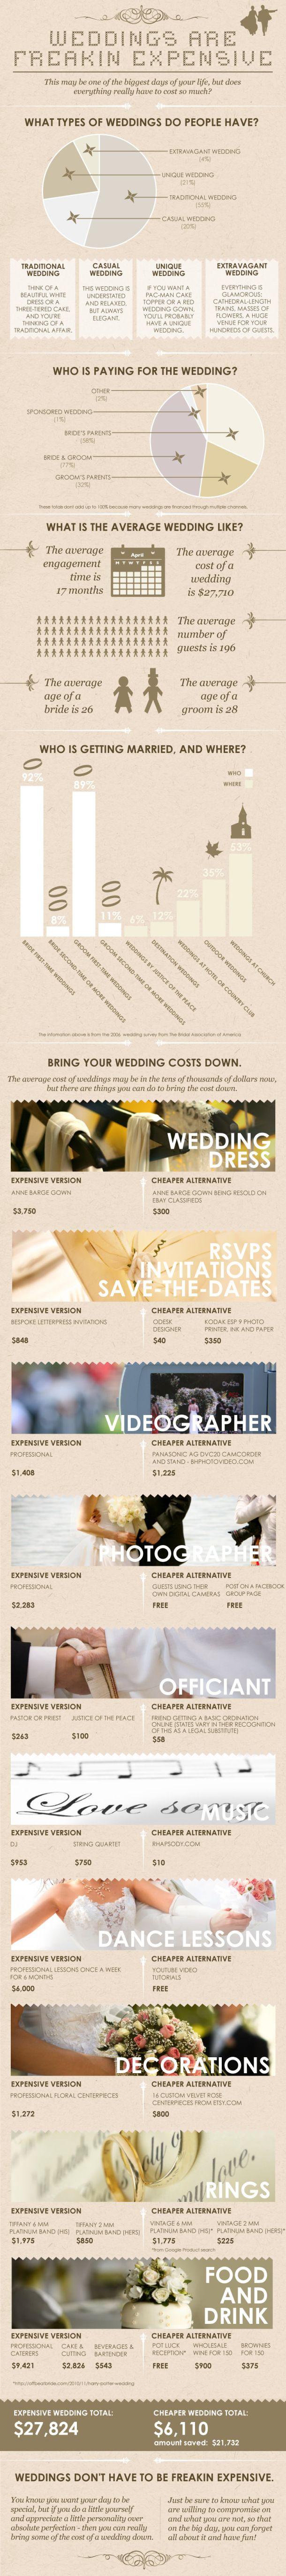 Wedding infographic #wedding #infographic #weddingplanning